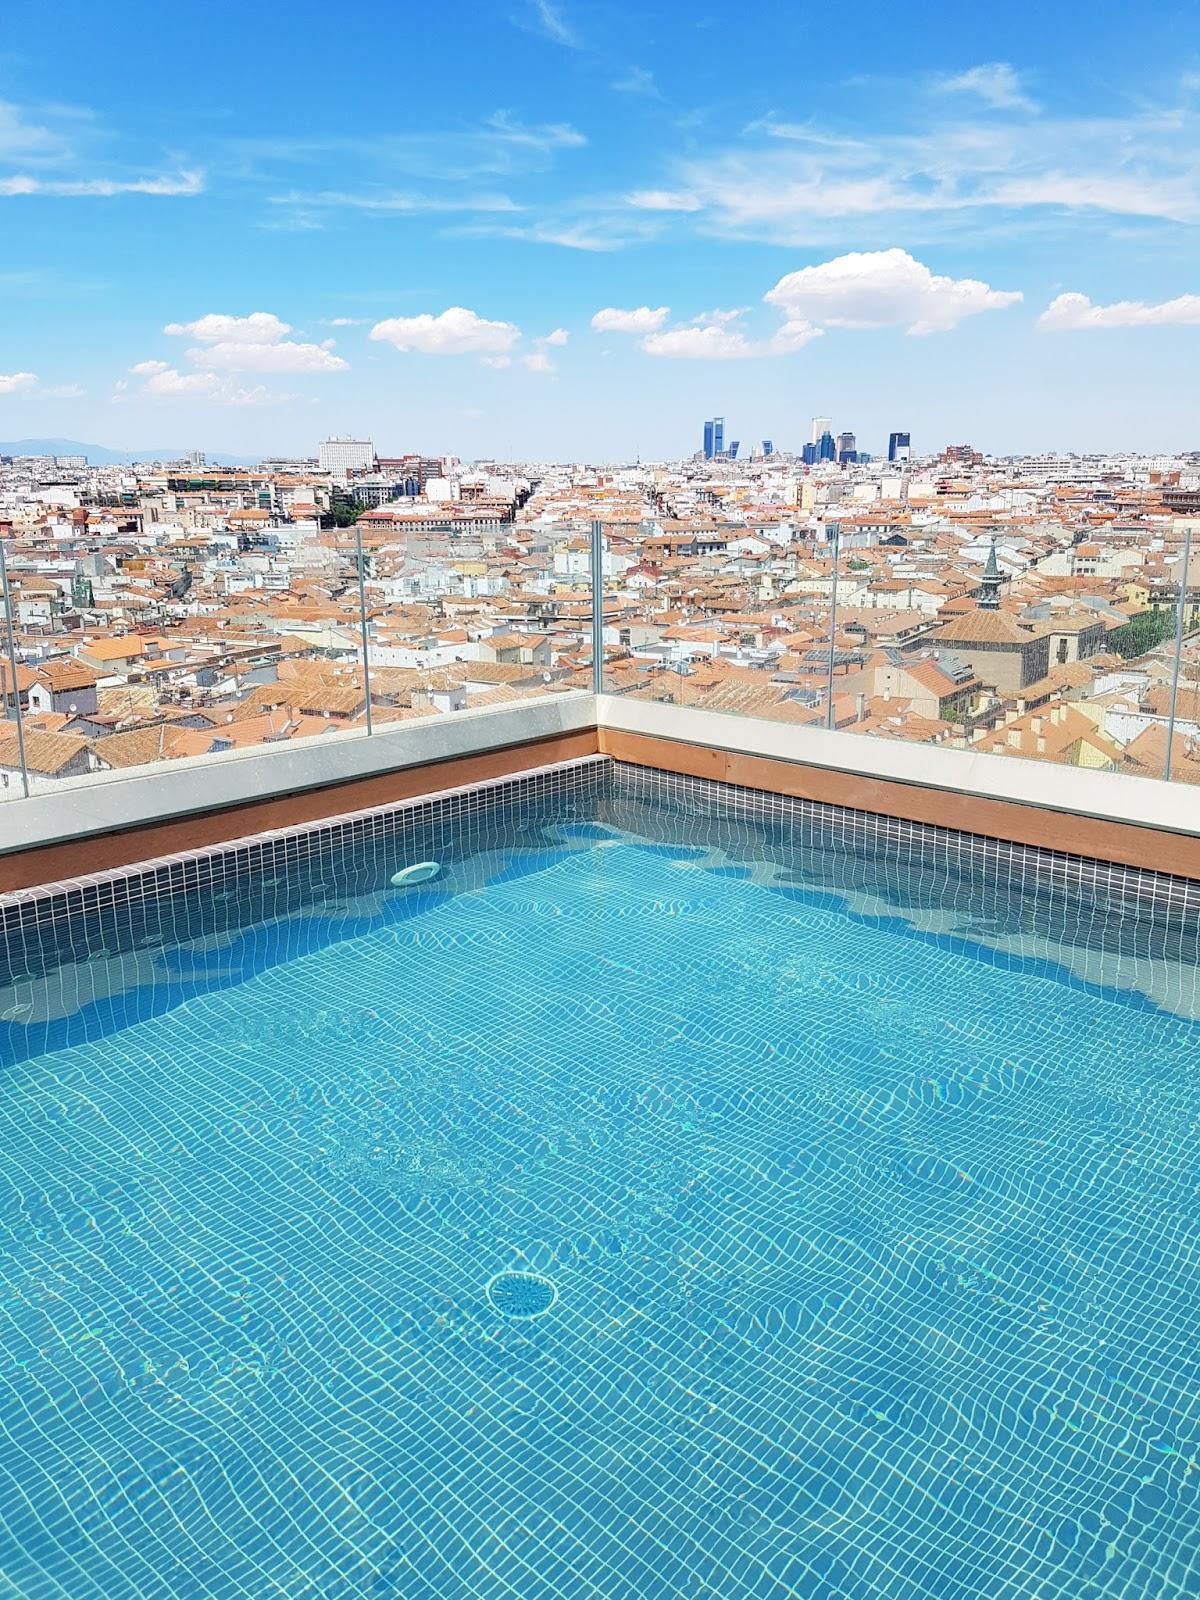 Postcards from italy homeaway e la gran via madrilena for Piscina 24 horas madrid